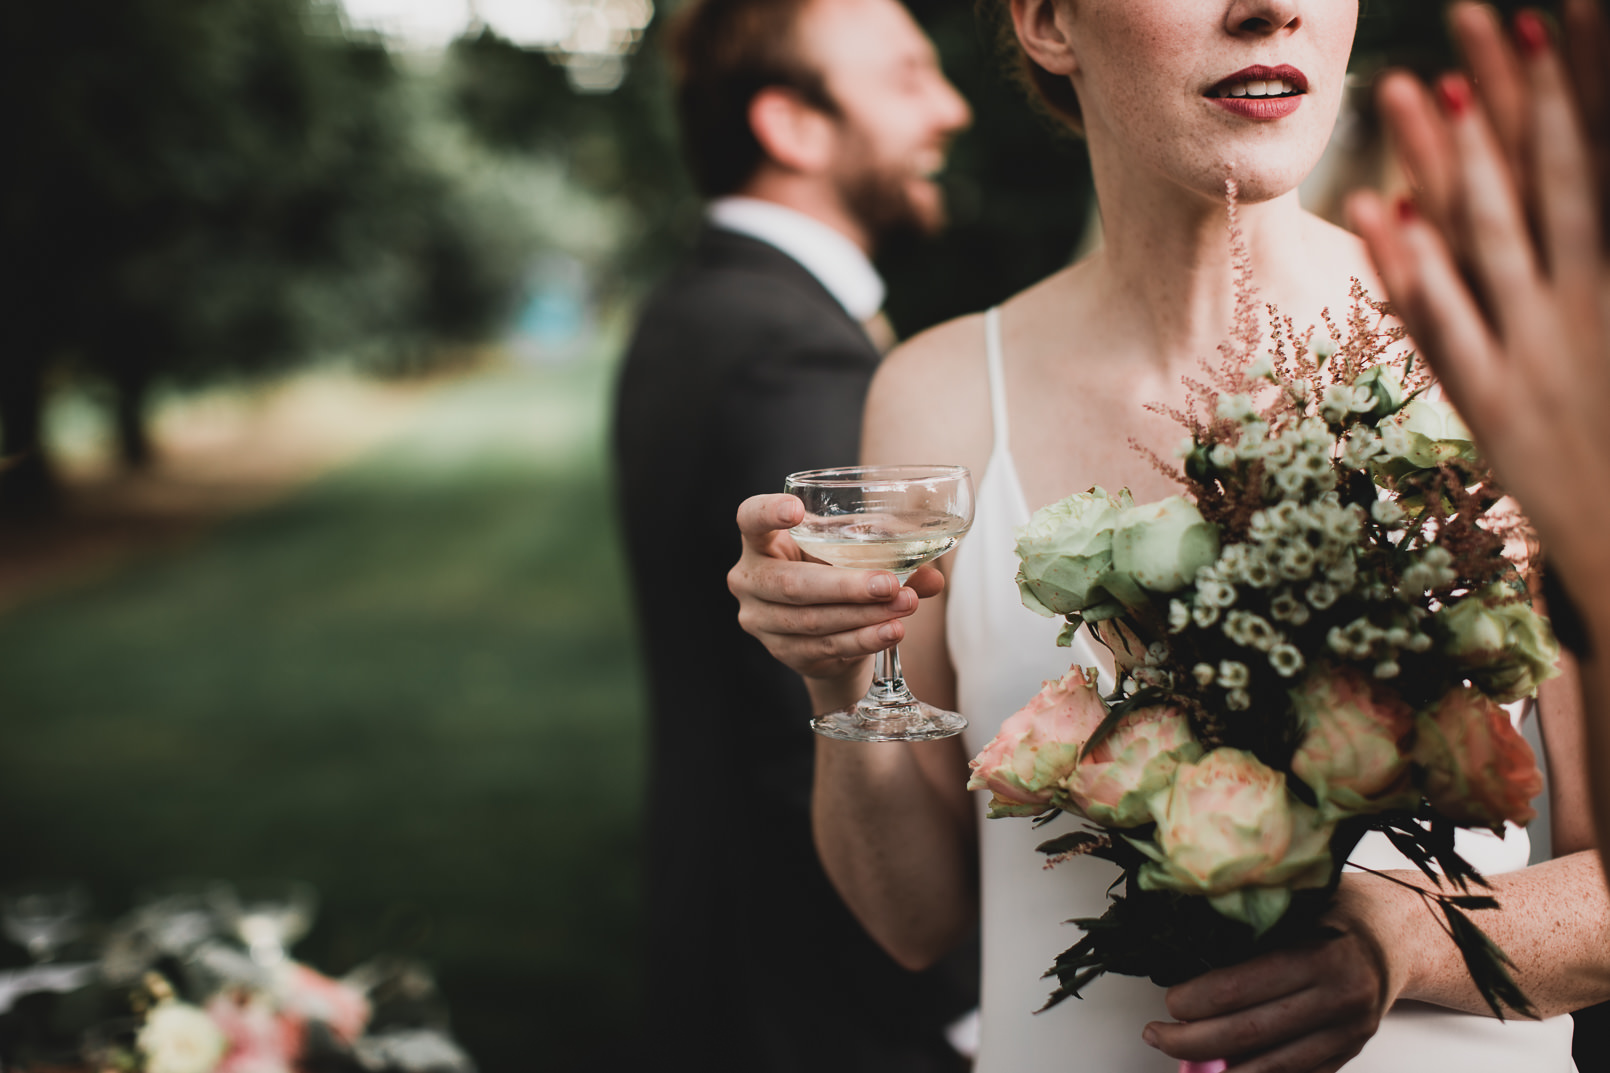 009-Jonathan-Kuhn-Photography-Wedding-_mini.jpg